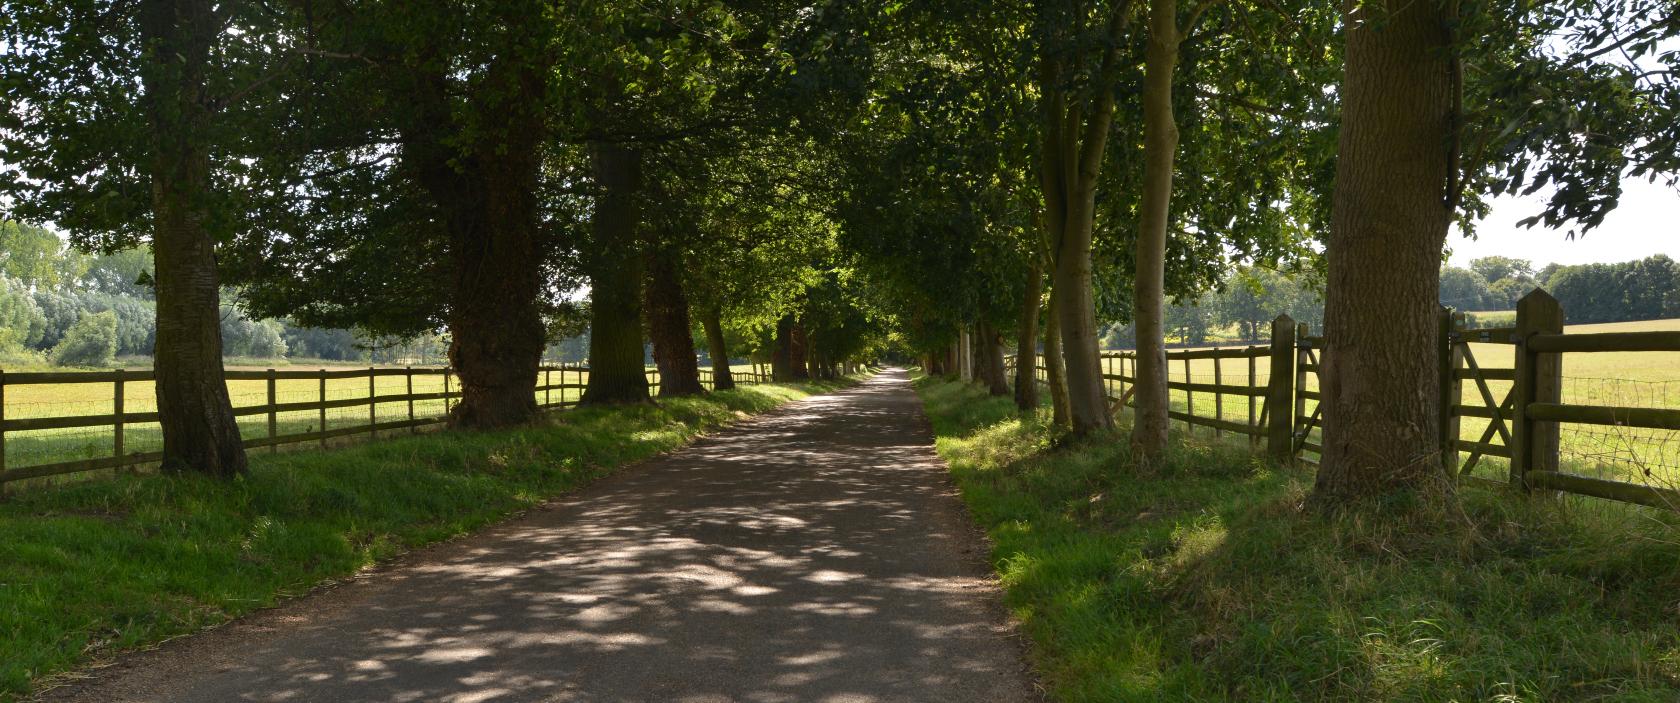 Gorhambury Drive, part of Gorhambury Estate, St Albans